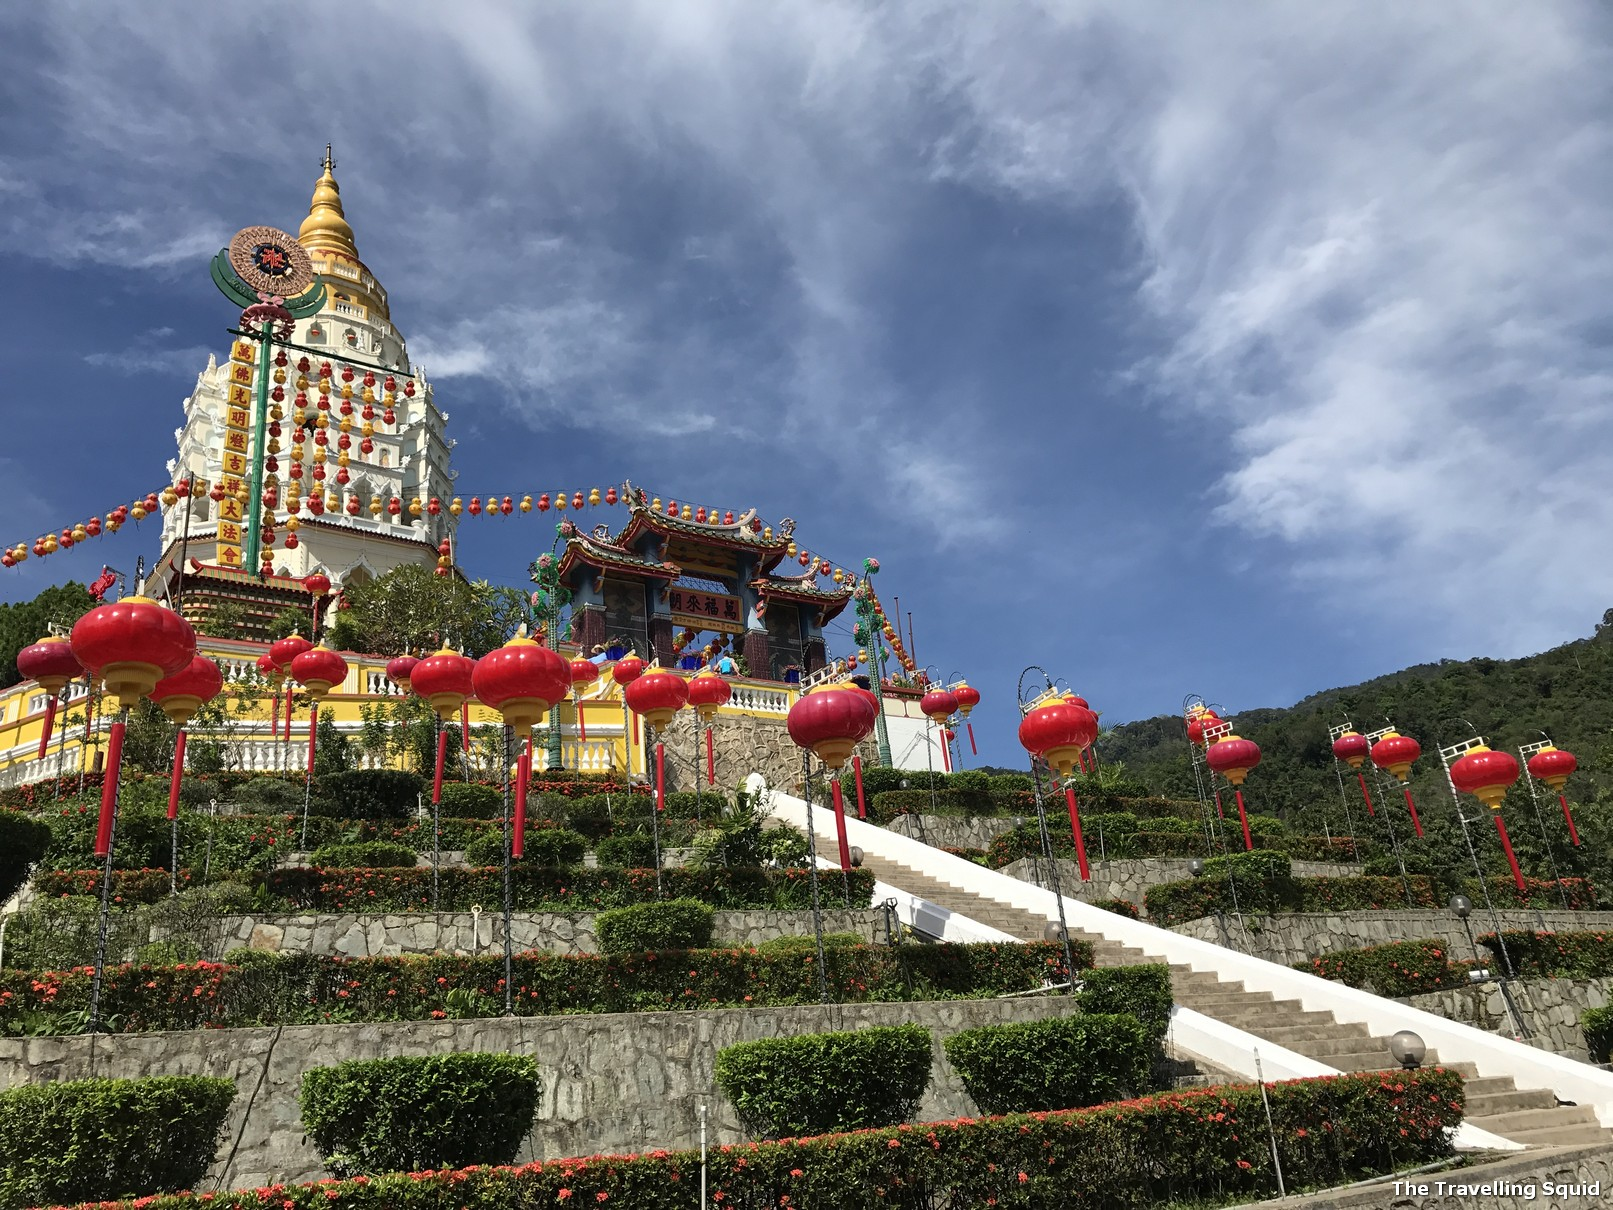 Kek Lok si penang temple